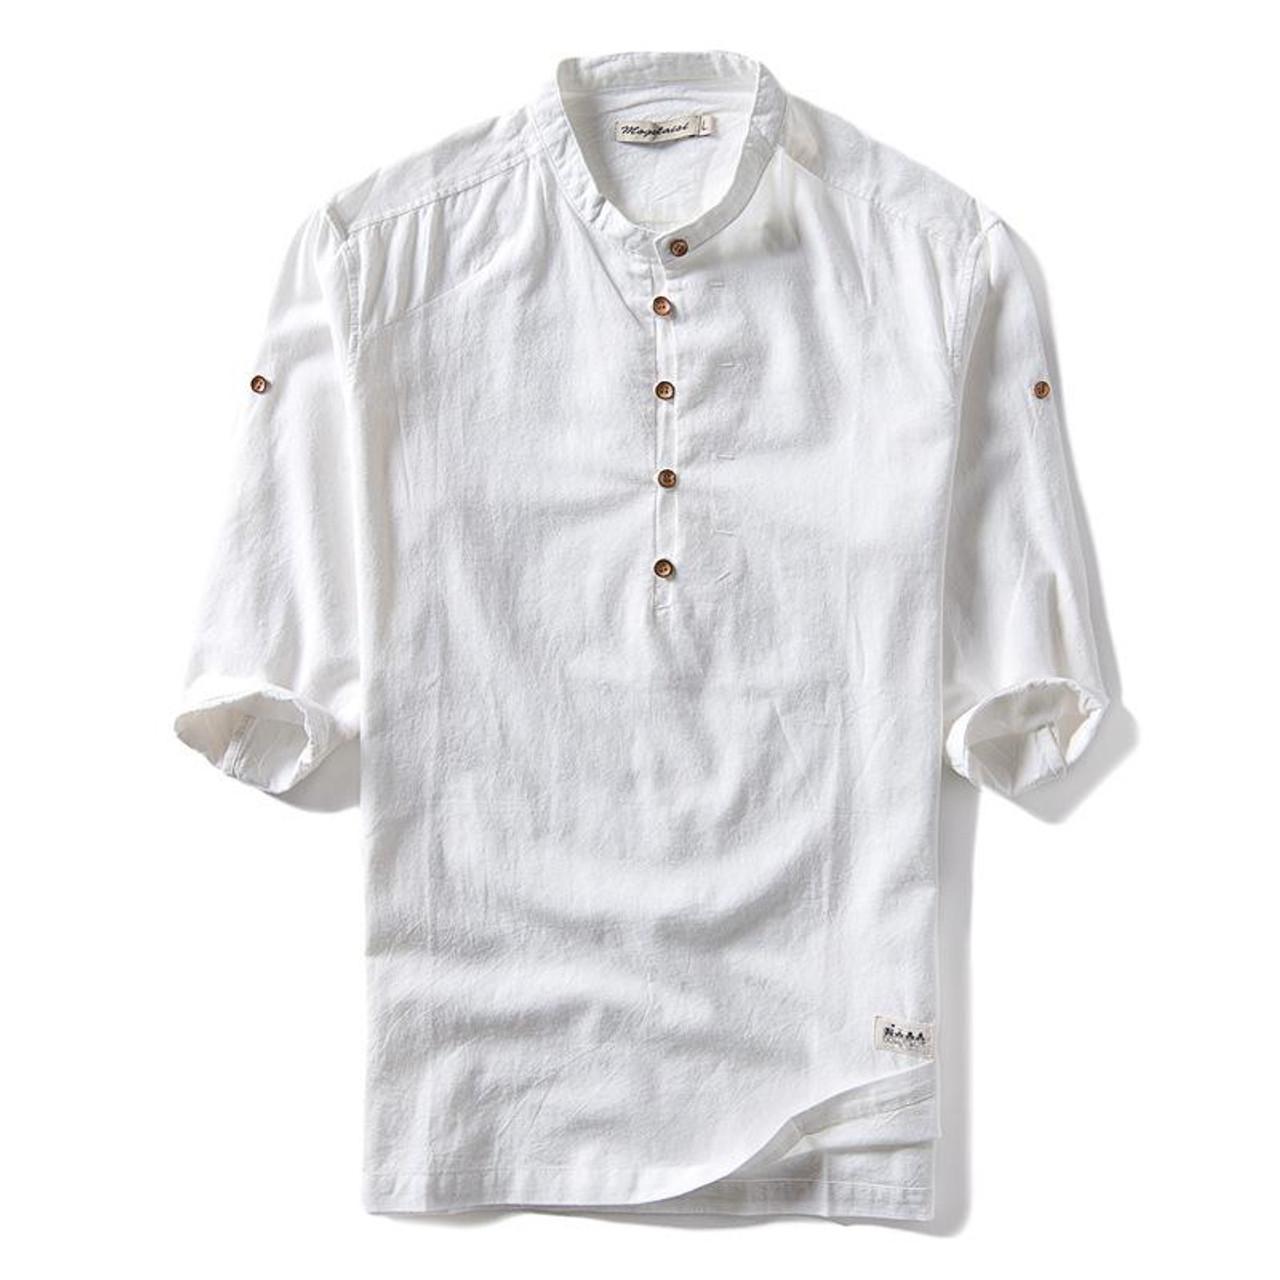 b5e9fc37 ... 2018 New Trend Fashion Summer Solid Color Shirt Men Stand Collar Cotton  Linen Half Sleeve Shirt ...